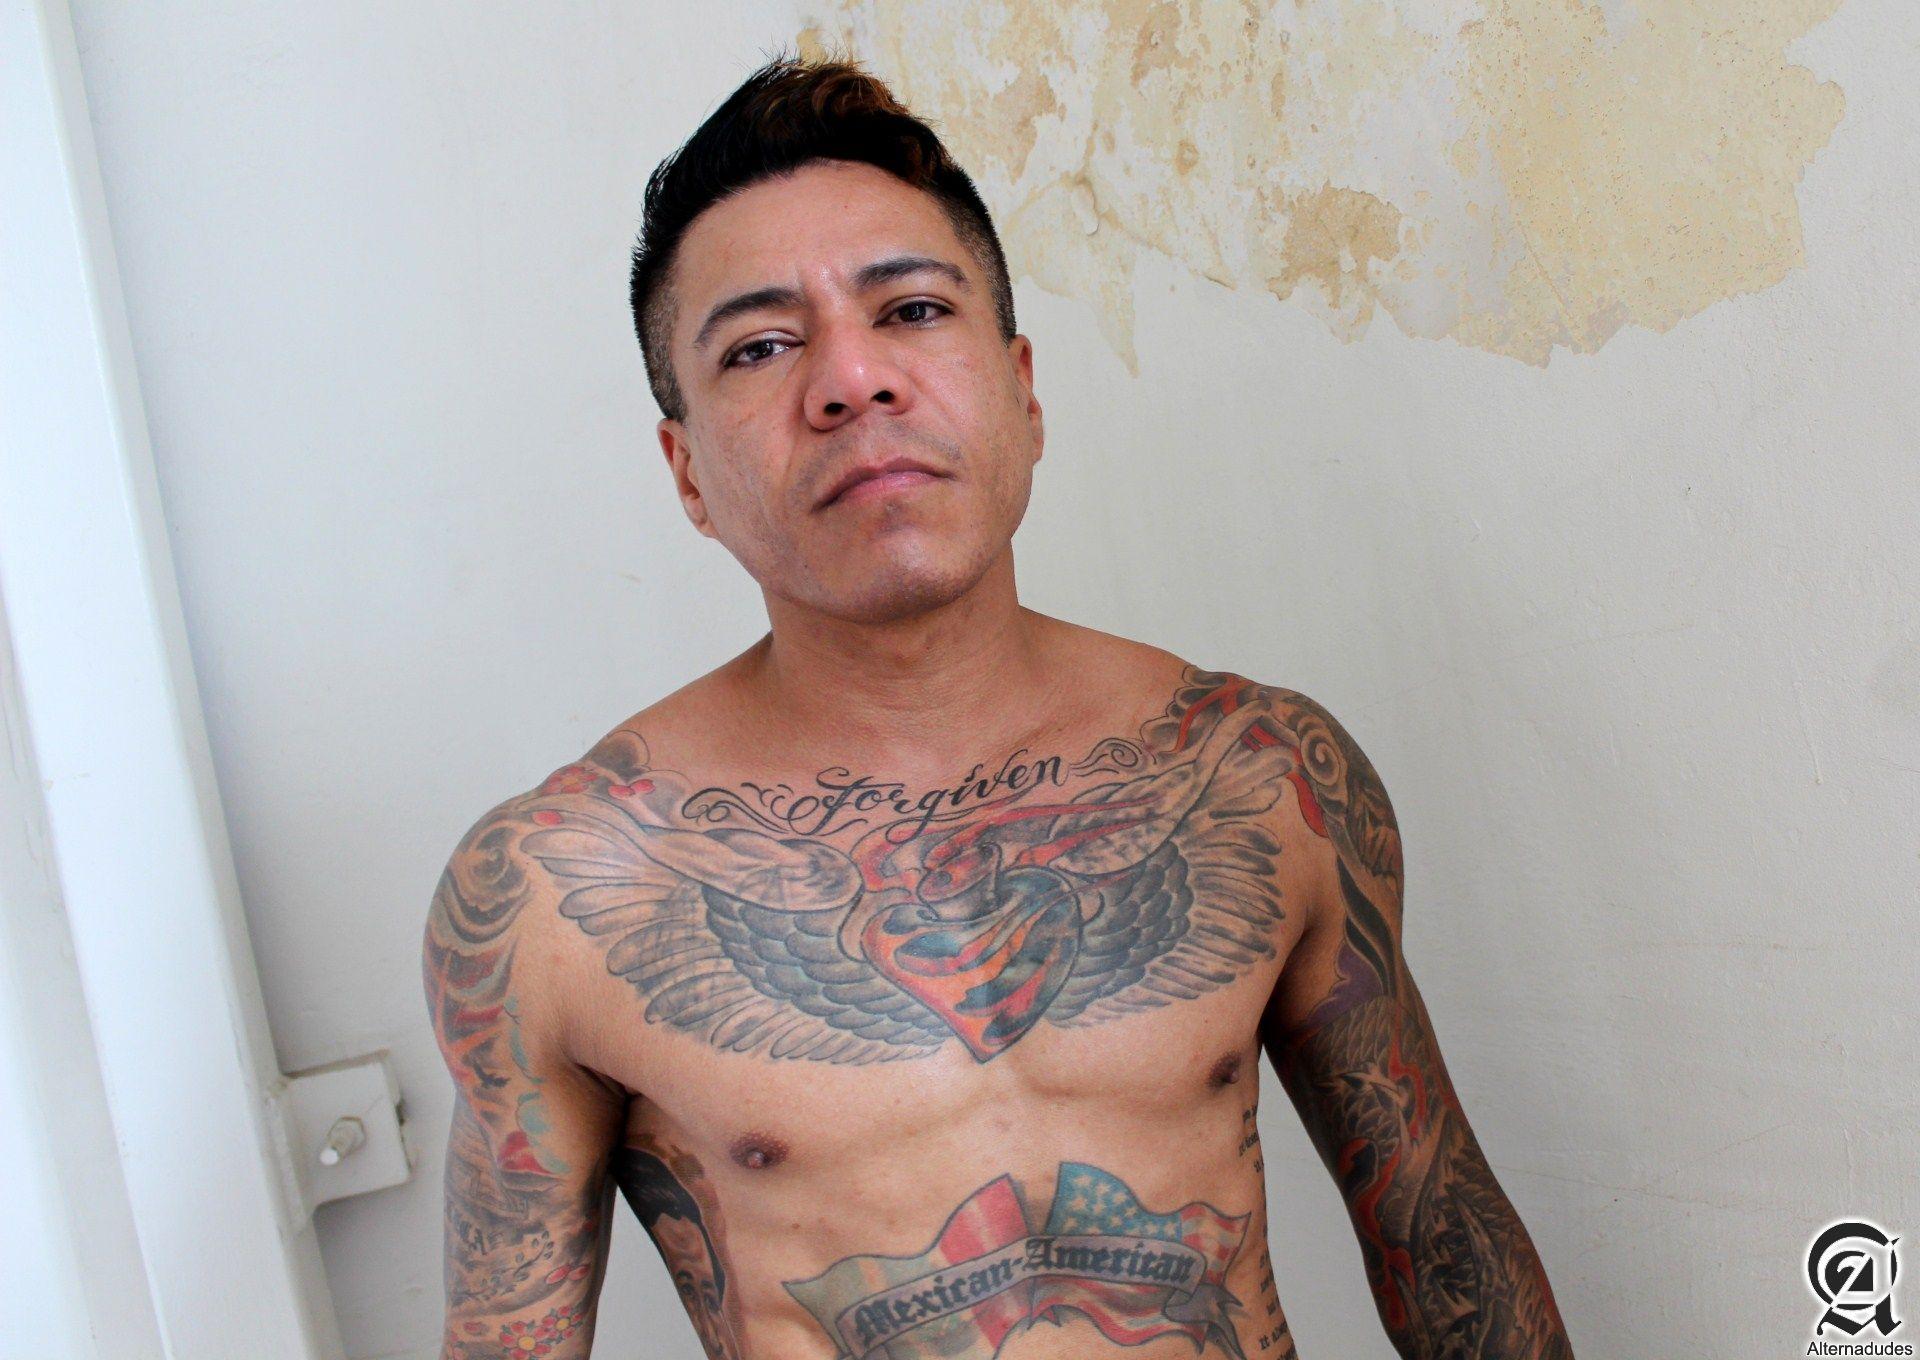 Alternadudes-Maxx-Sanchez-Tatted-Mexican-Daddy-Big-Cock-Amateur-Gay-Porn-01.jpg